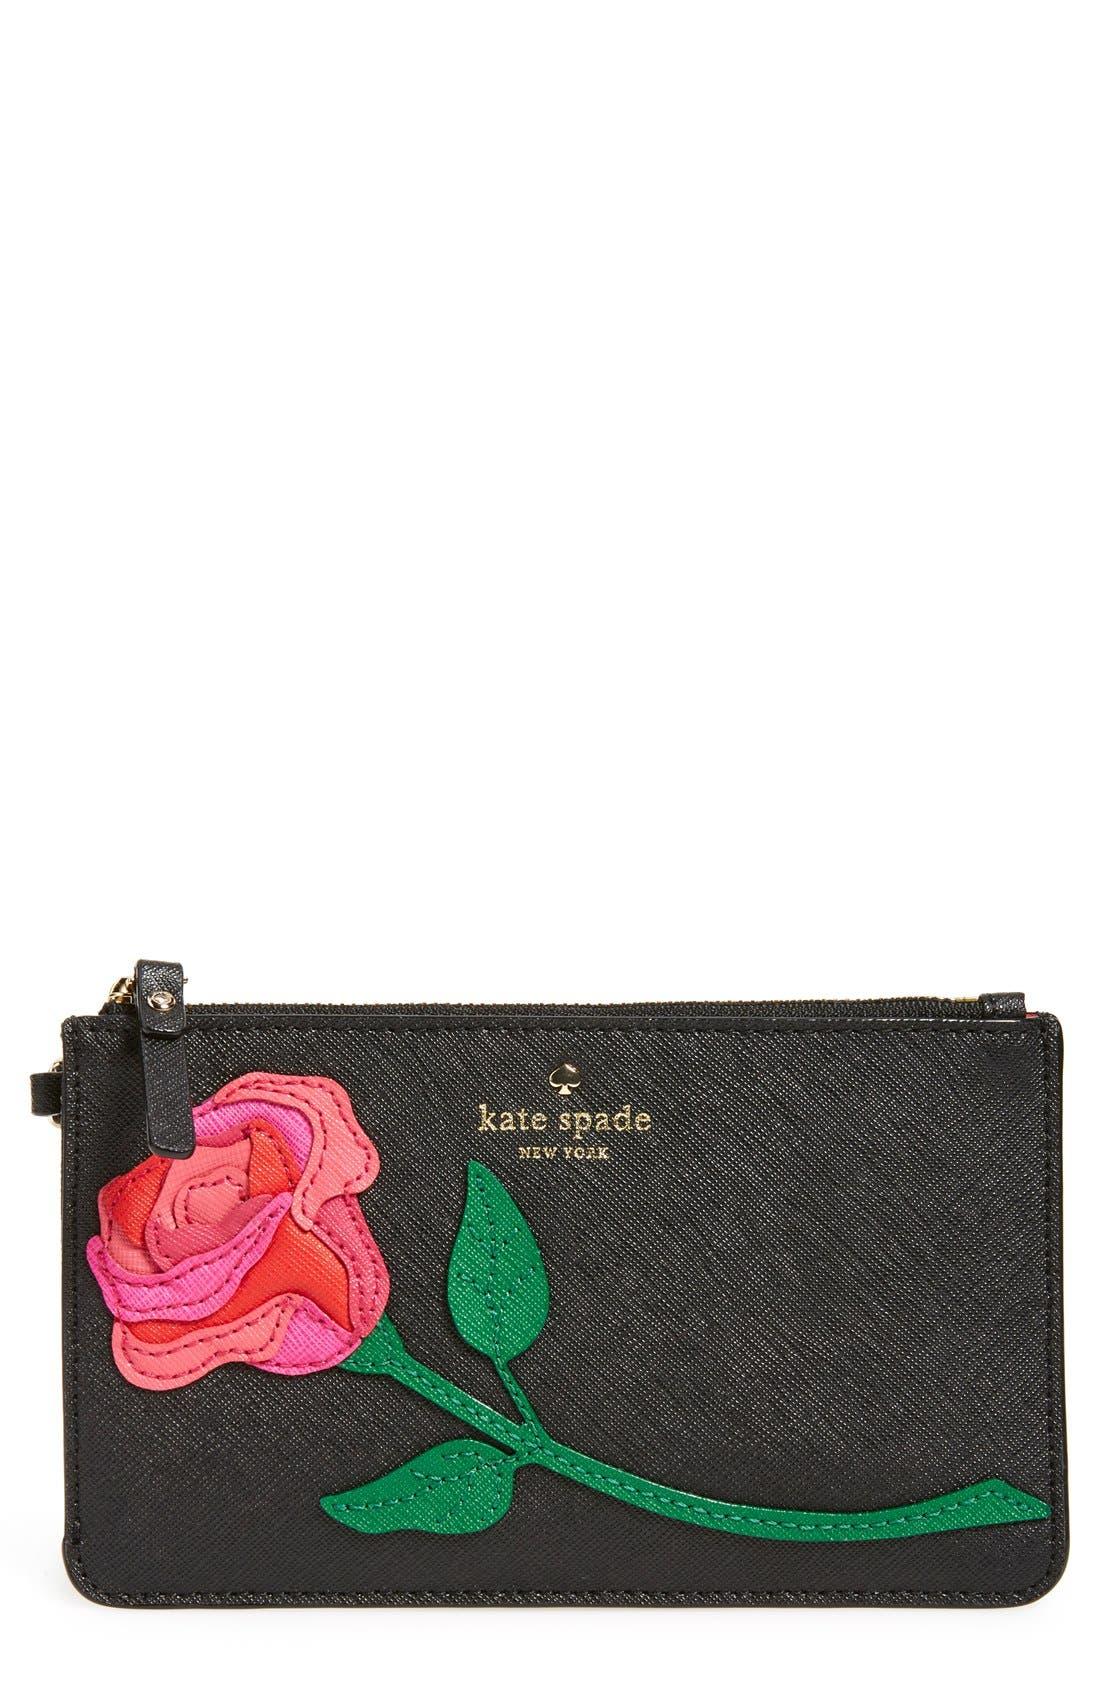 Main Image - kate spade new york 'rose appliqué - slim bee' wristlet